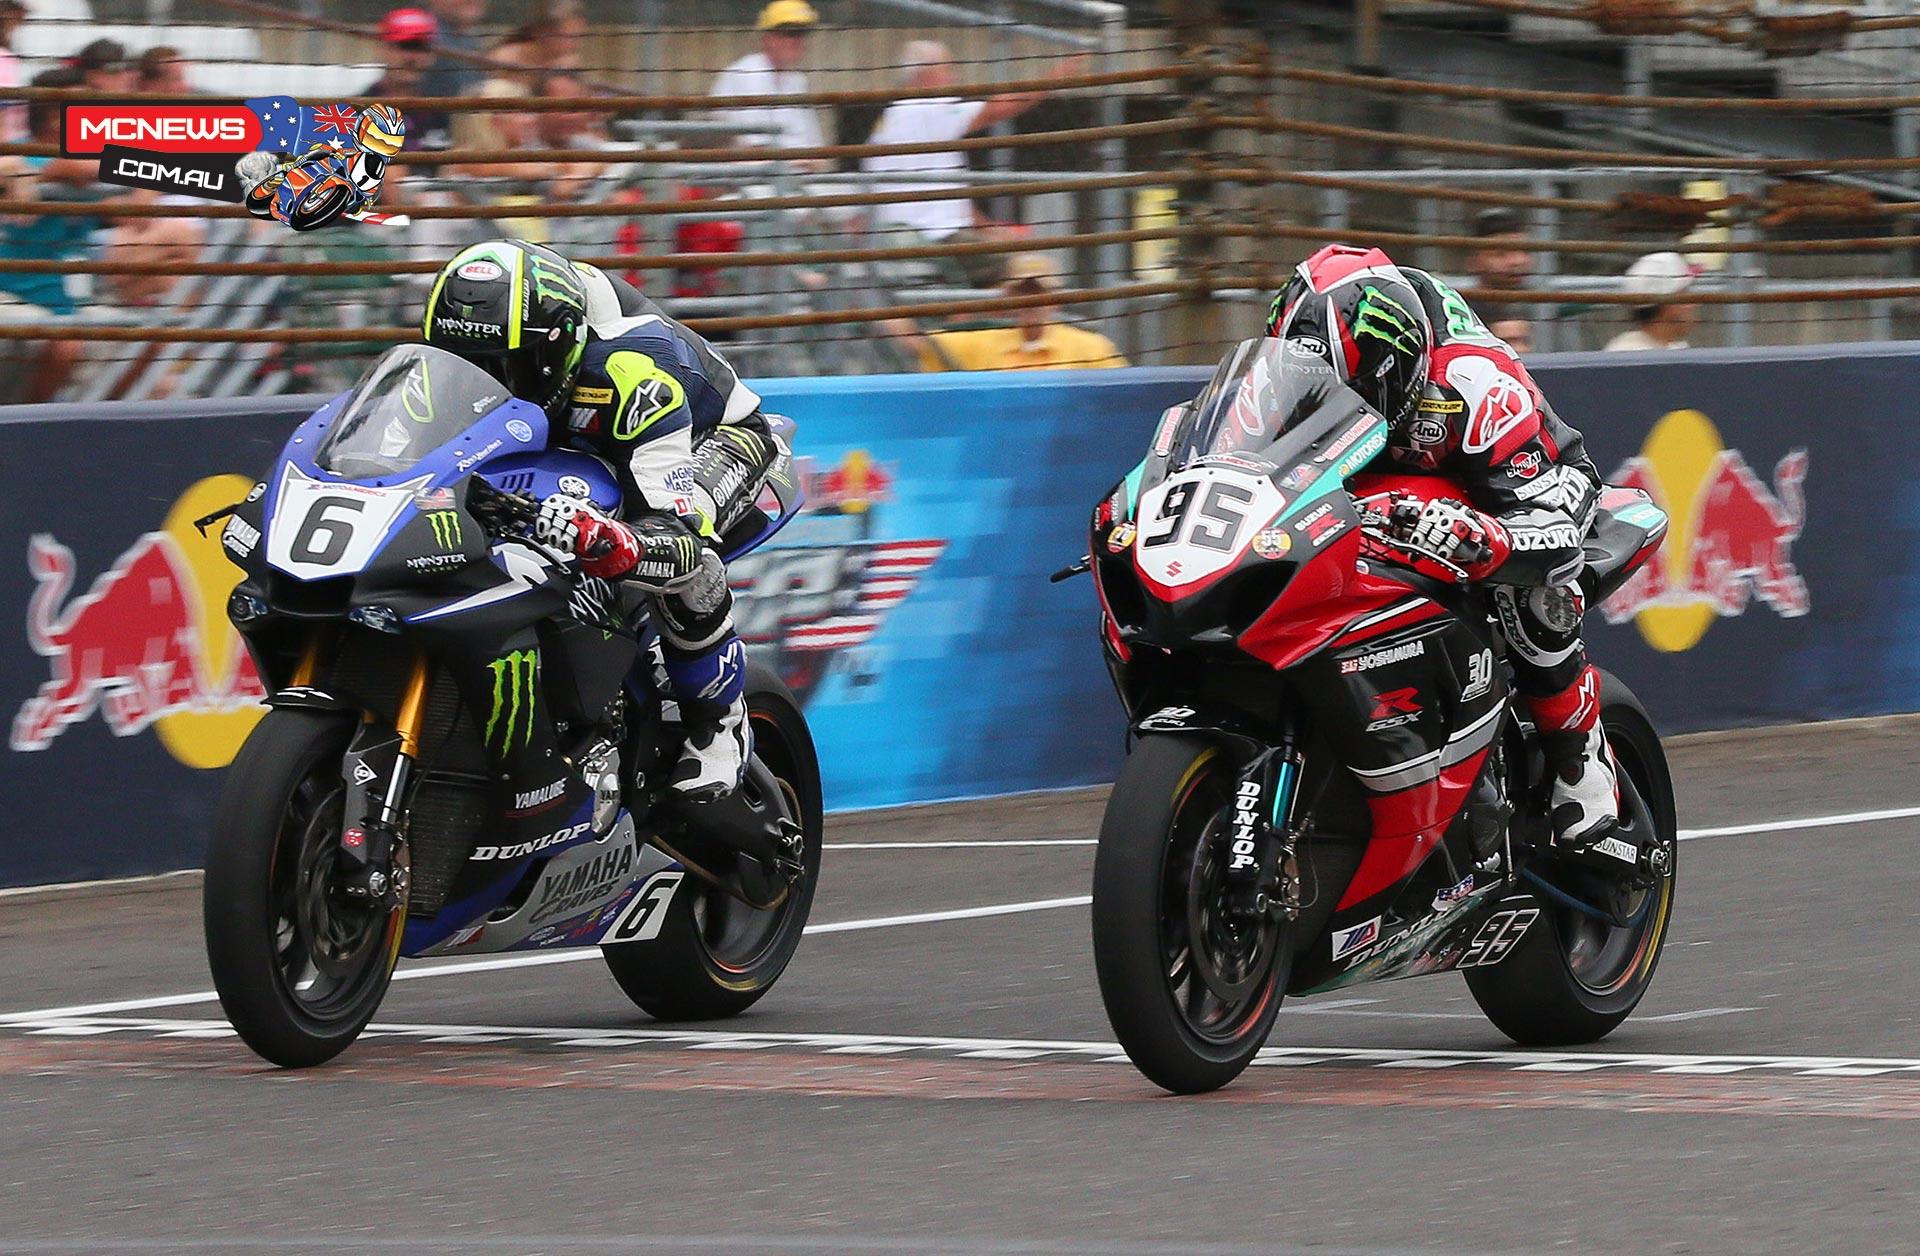 MotoAmerica - Indy Superbike - Cam Beaubier leads Roger Hayden